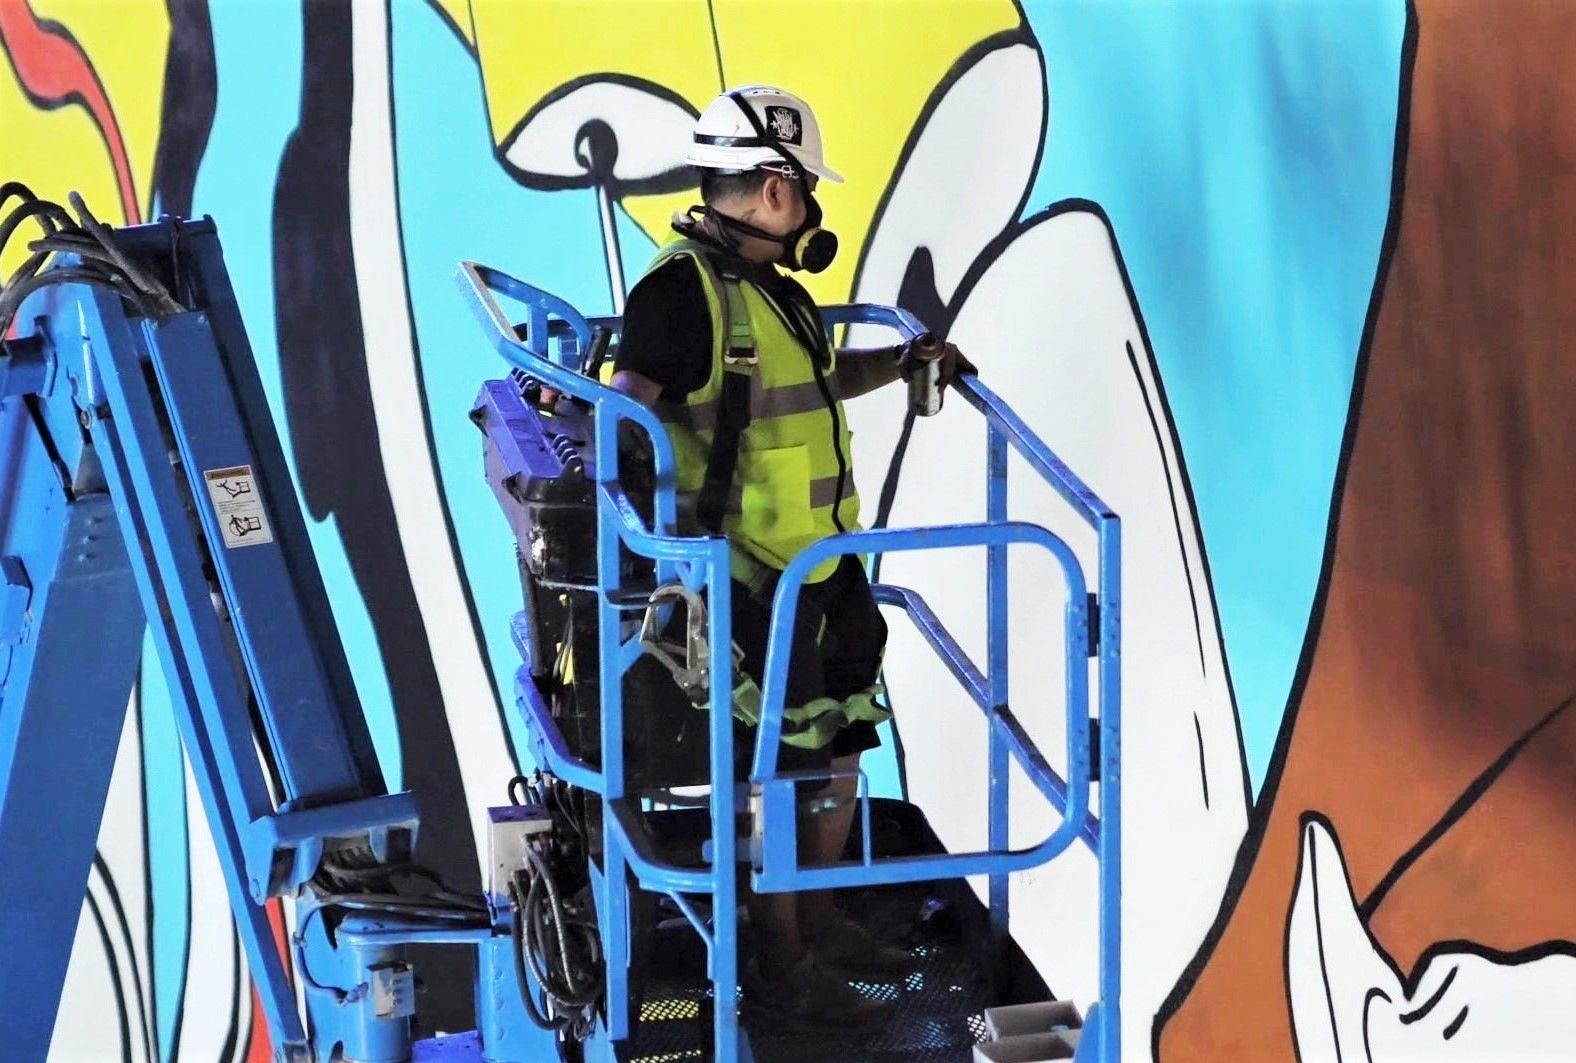 ARTFIVE0 Public Mural, Nesma Moharam, ICD Brookfield Place, Installation